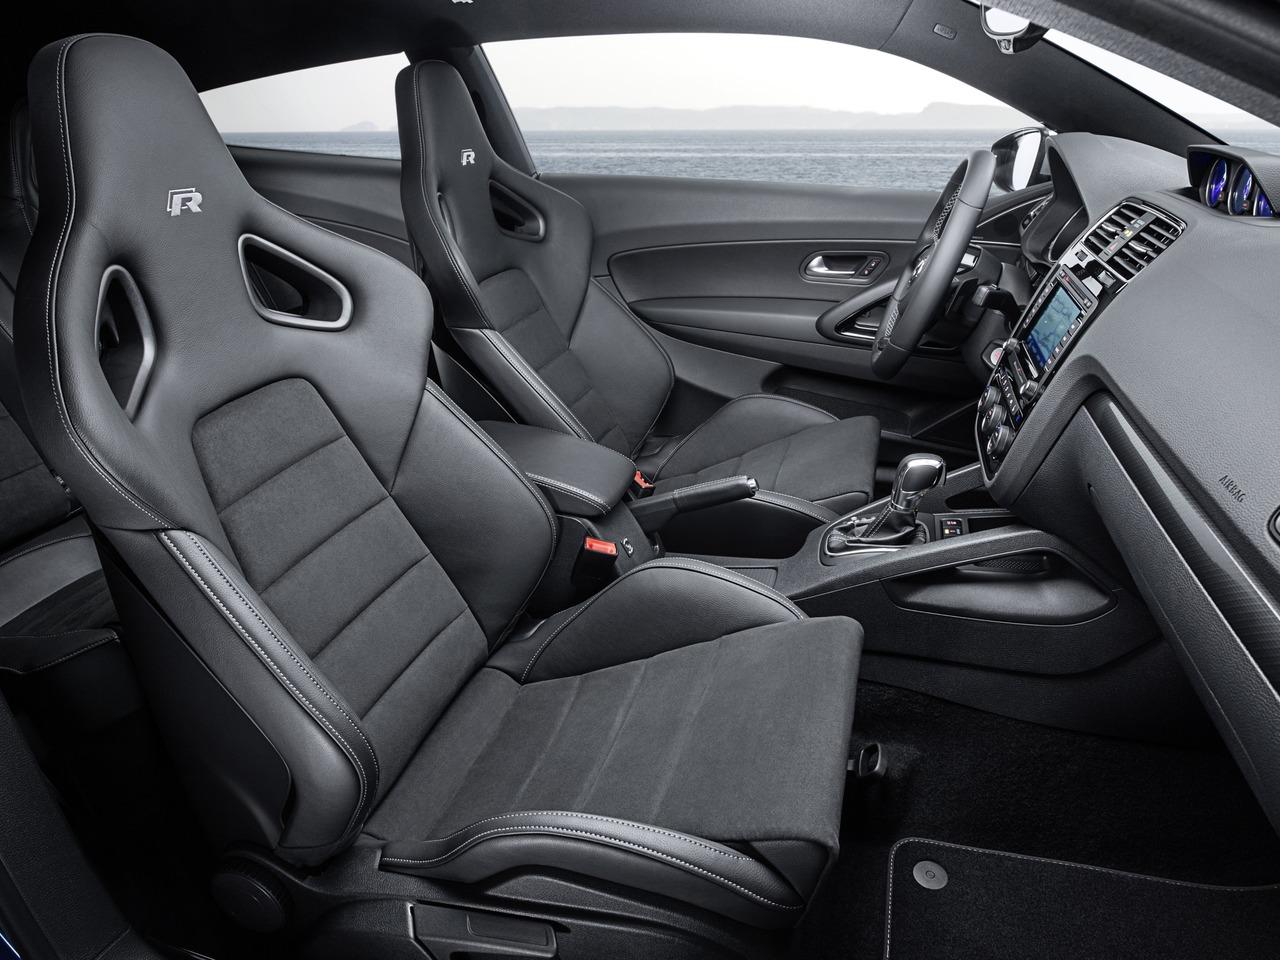 Снимки: Volkswagen Scirocco Facelift